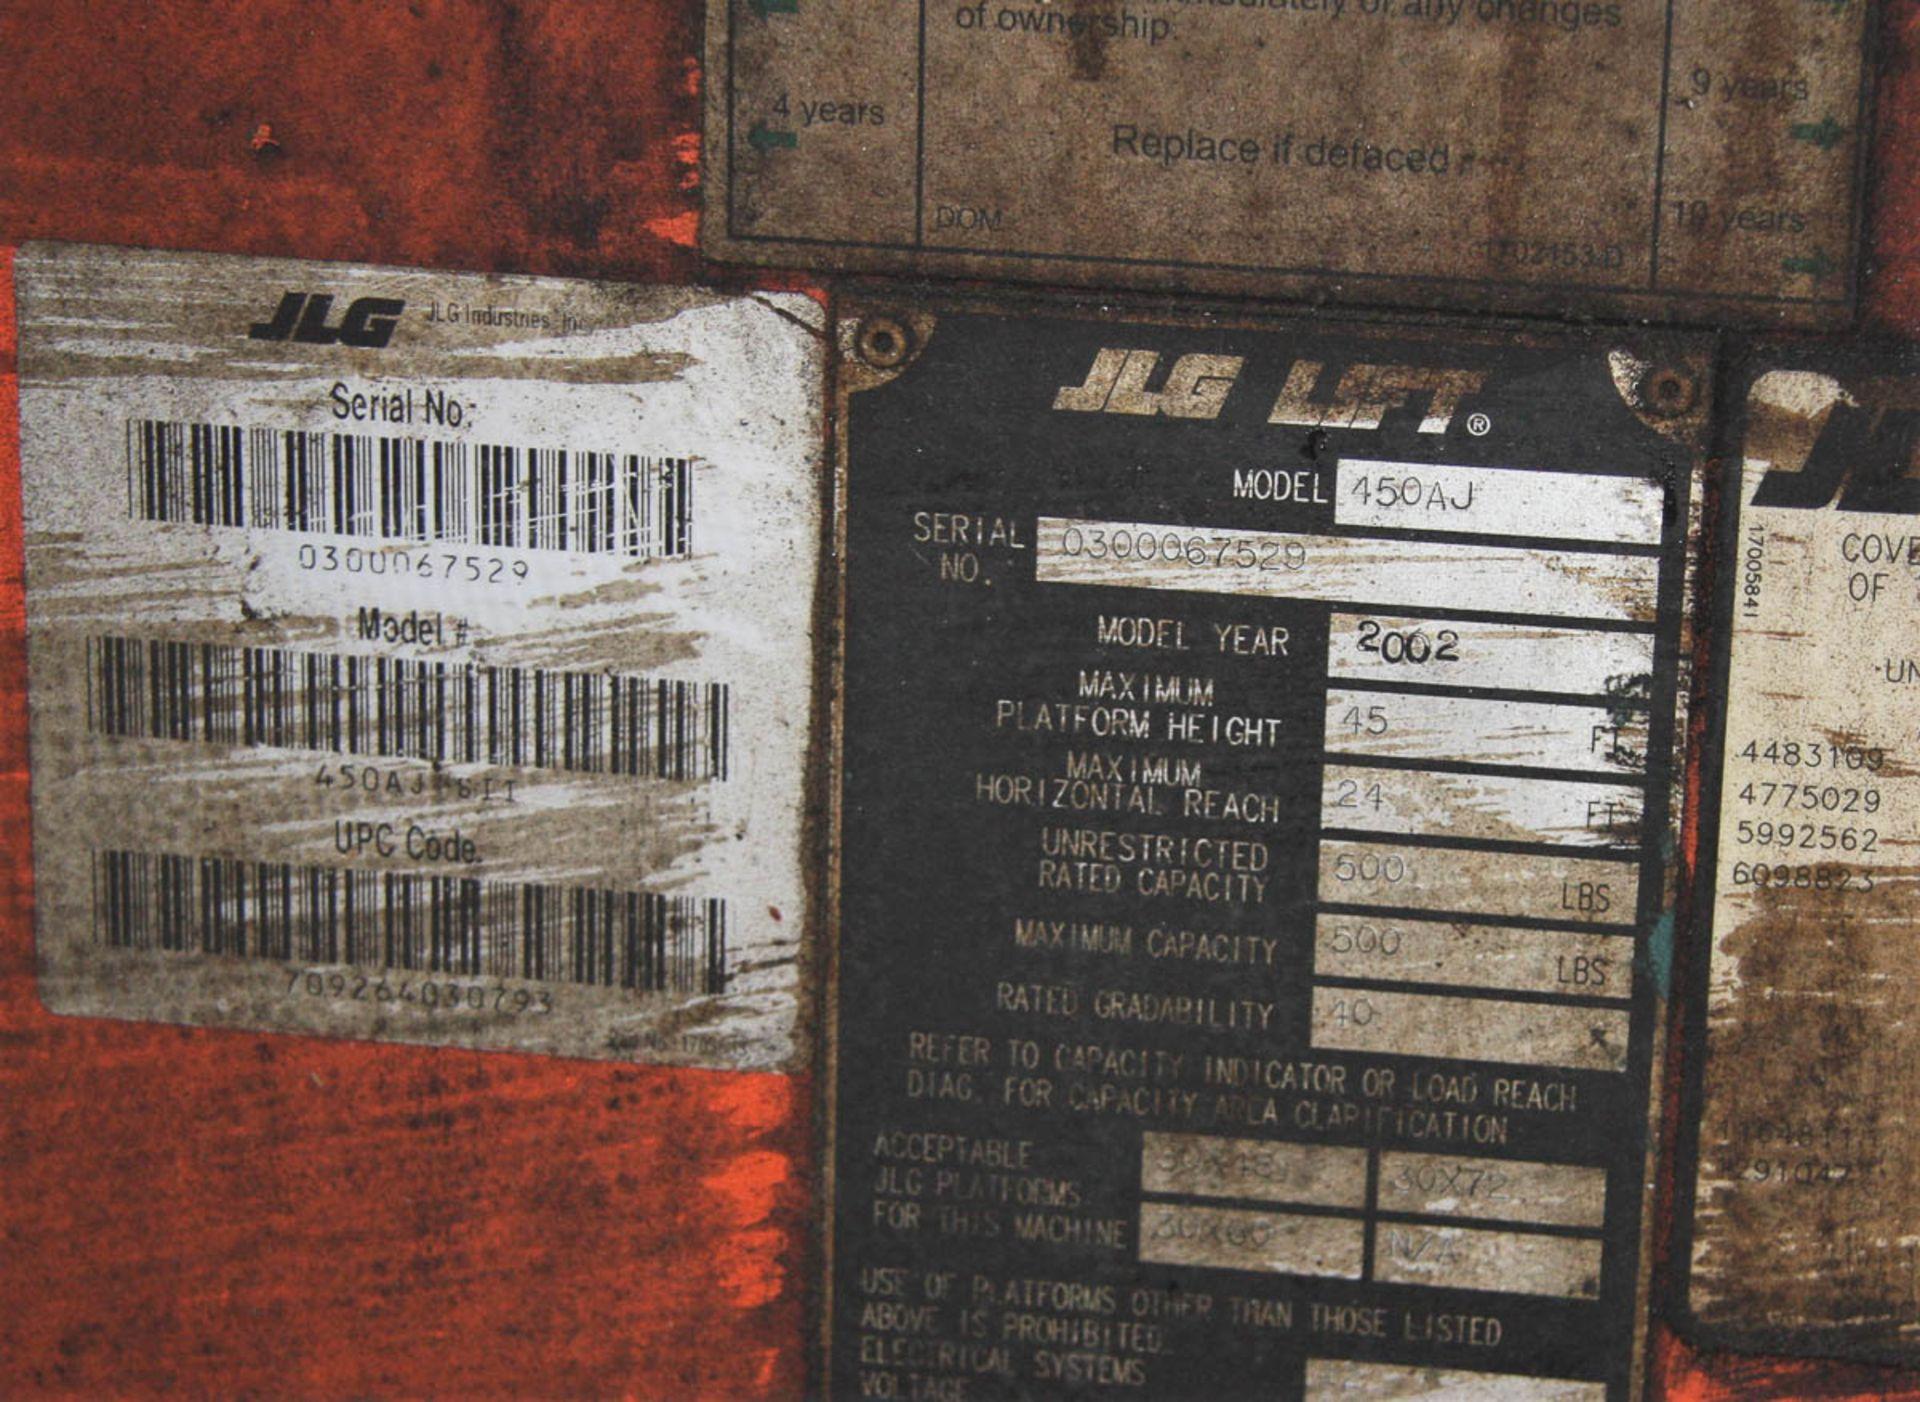 2002 JLG 450AJ SEIRES II BOOM LIFT, DIESEL, WITH 45' MAX HEIGHT, 500# CAPACITY, 24' HORIZONTAL - Image 4 of 9